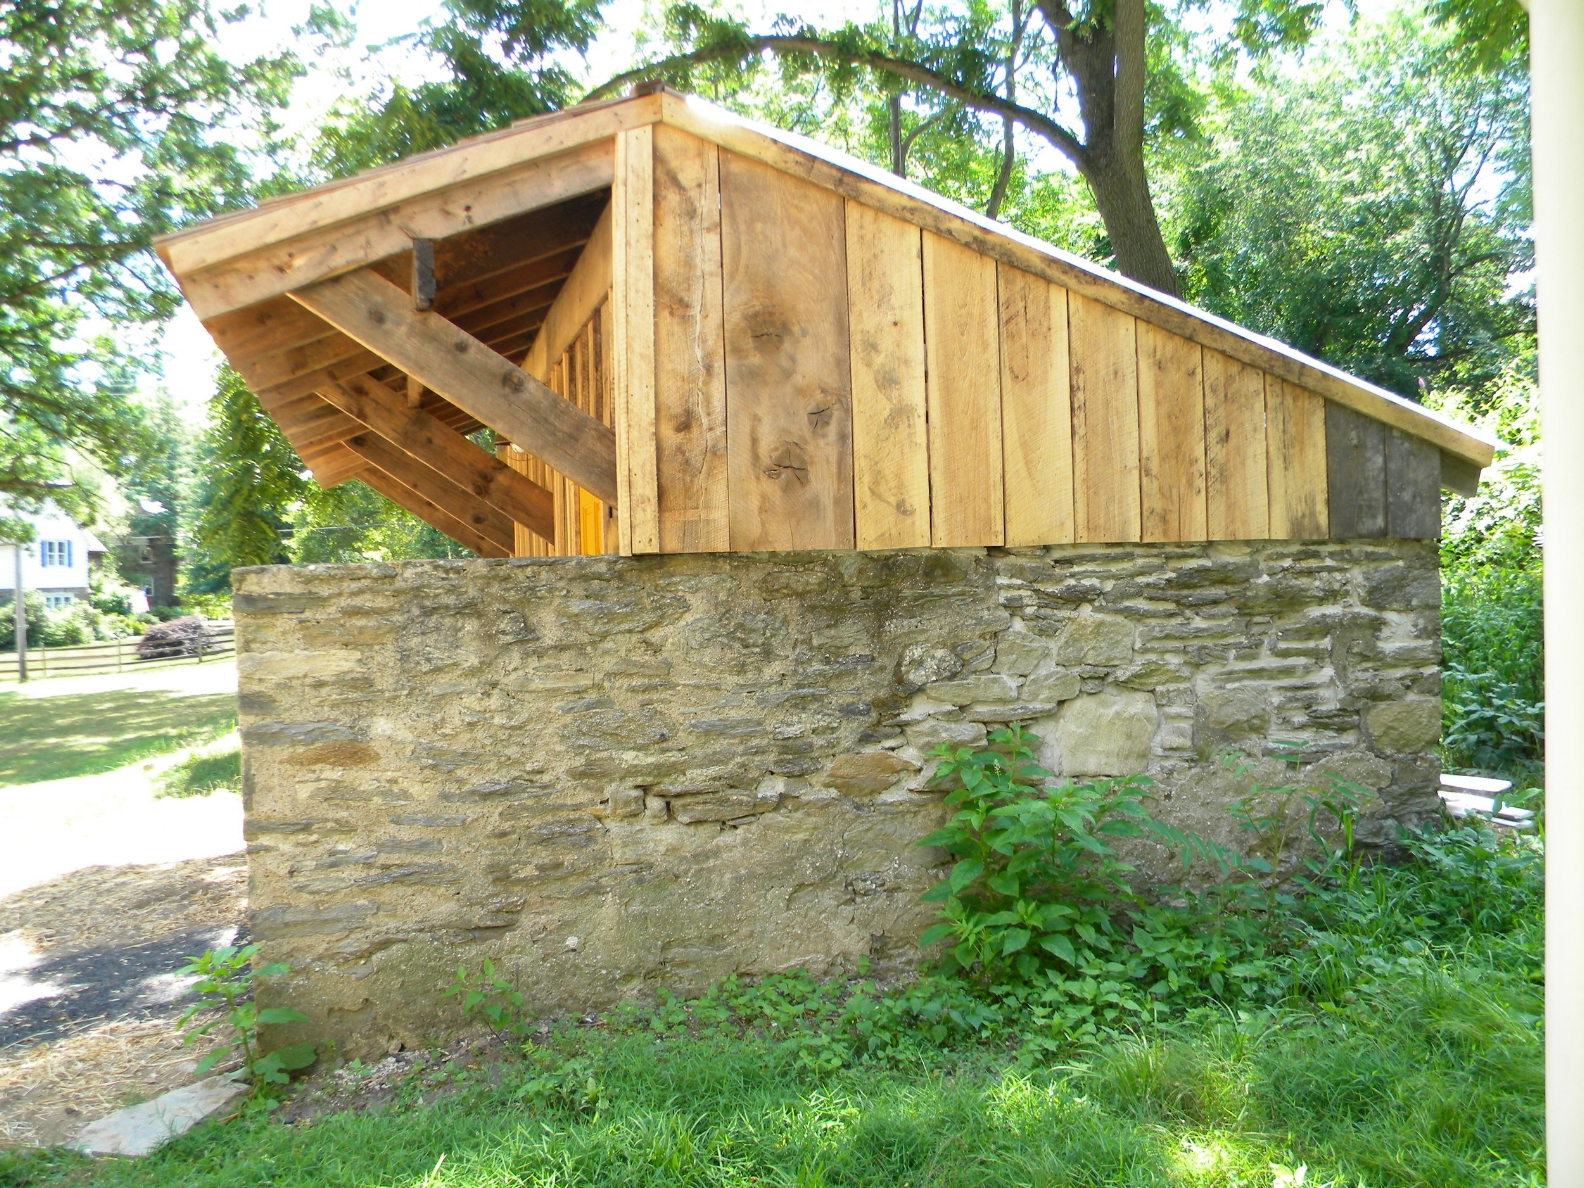 Meetinghouse Reclaimed Wood Outbuilding Side.jpg